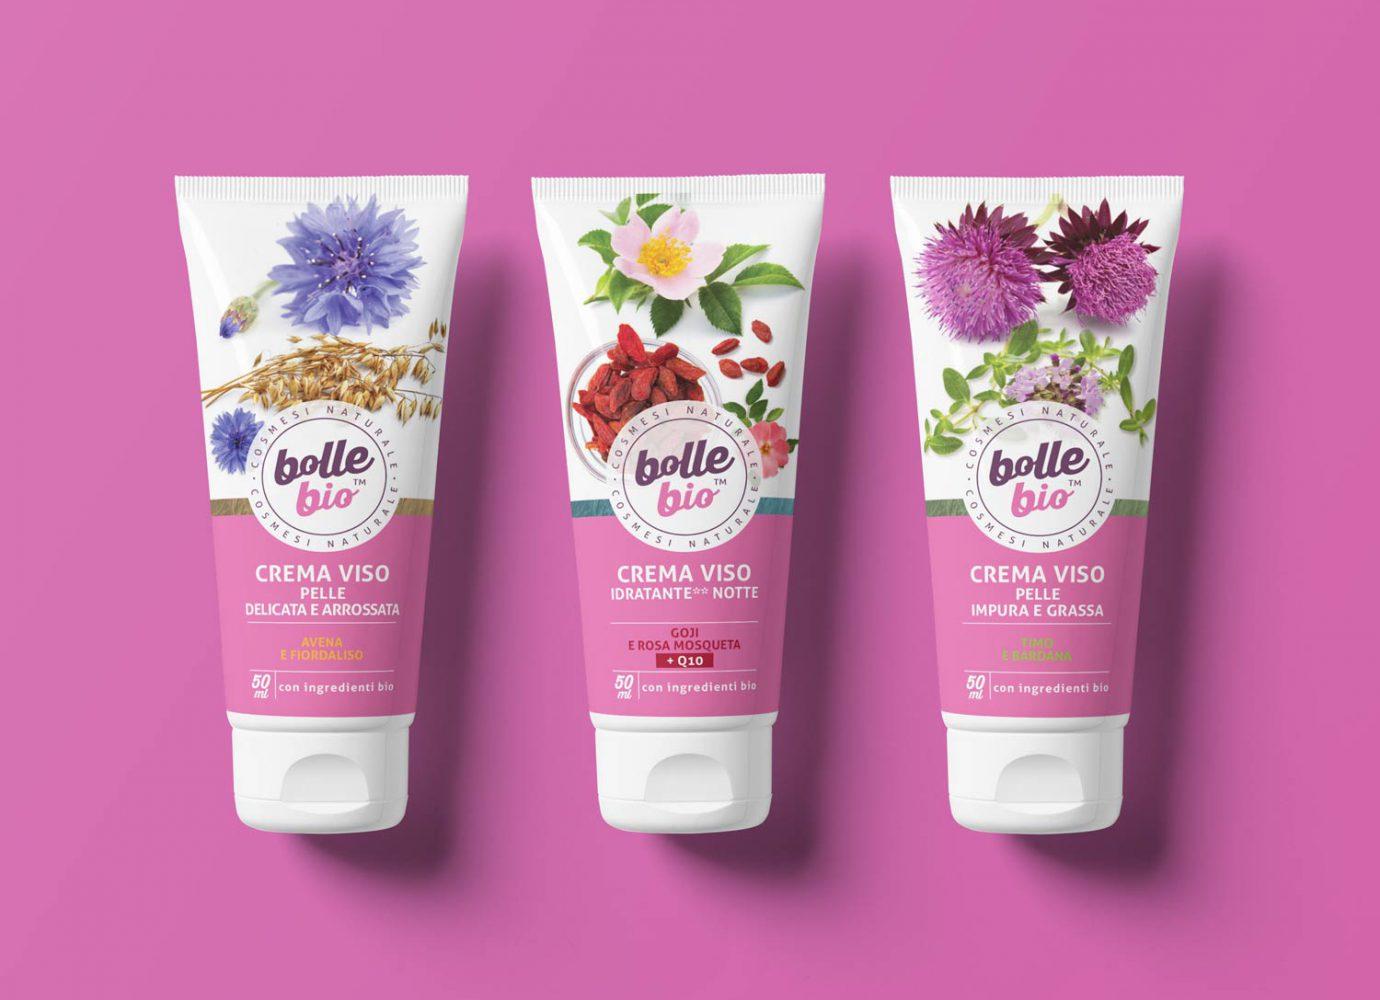 Packaging design di tubi creme viso di cosmesi naturale per millennial realizzato da WillBe